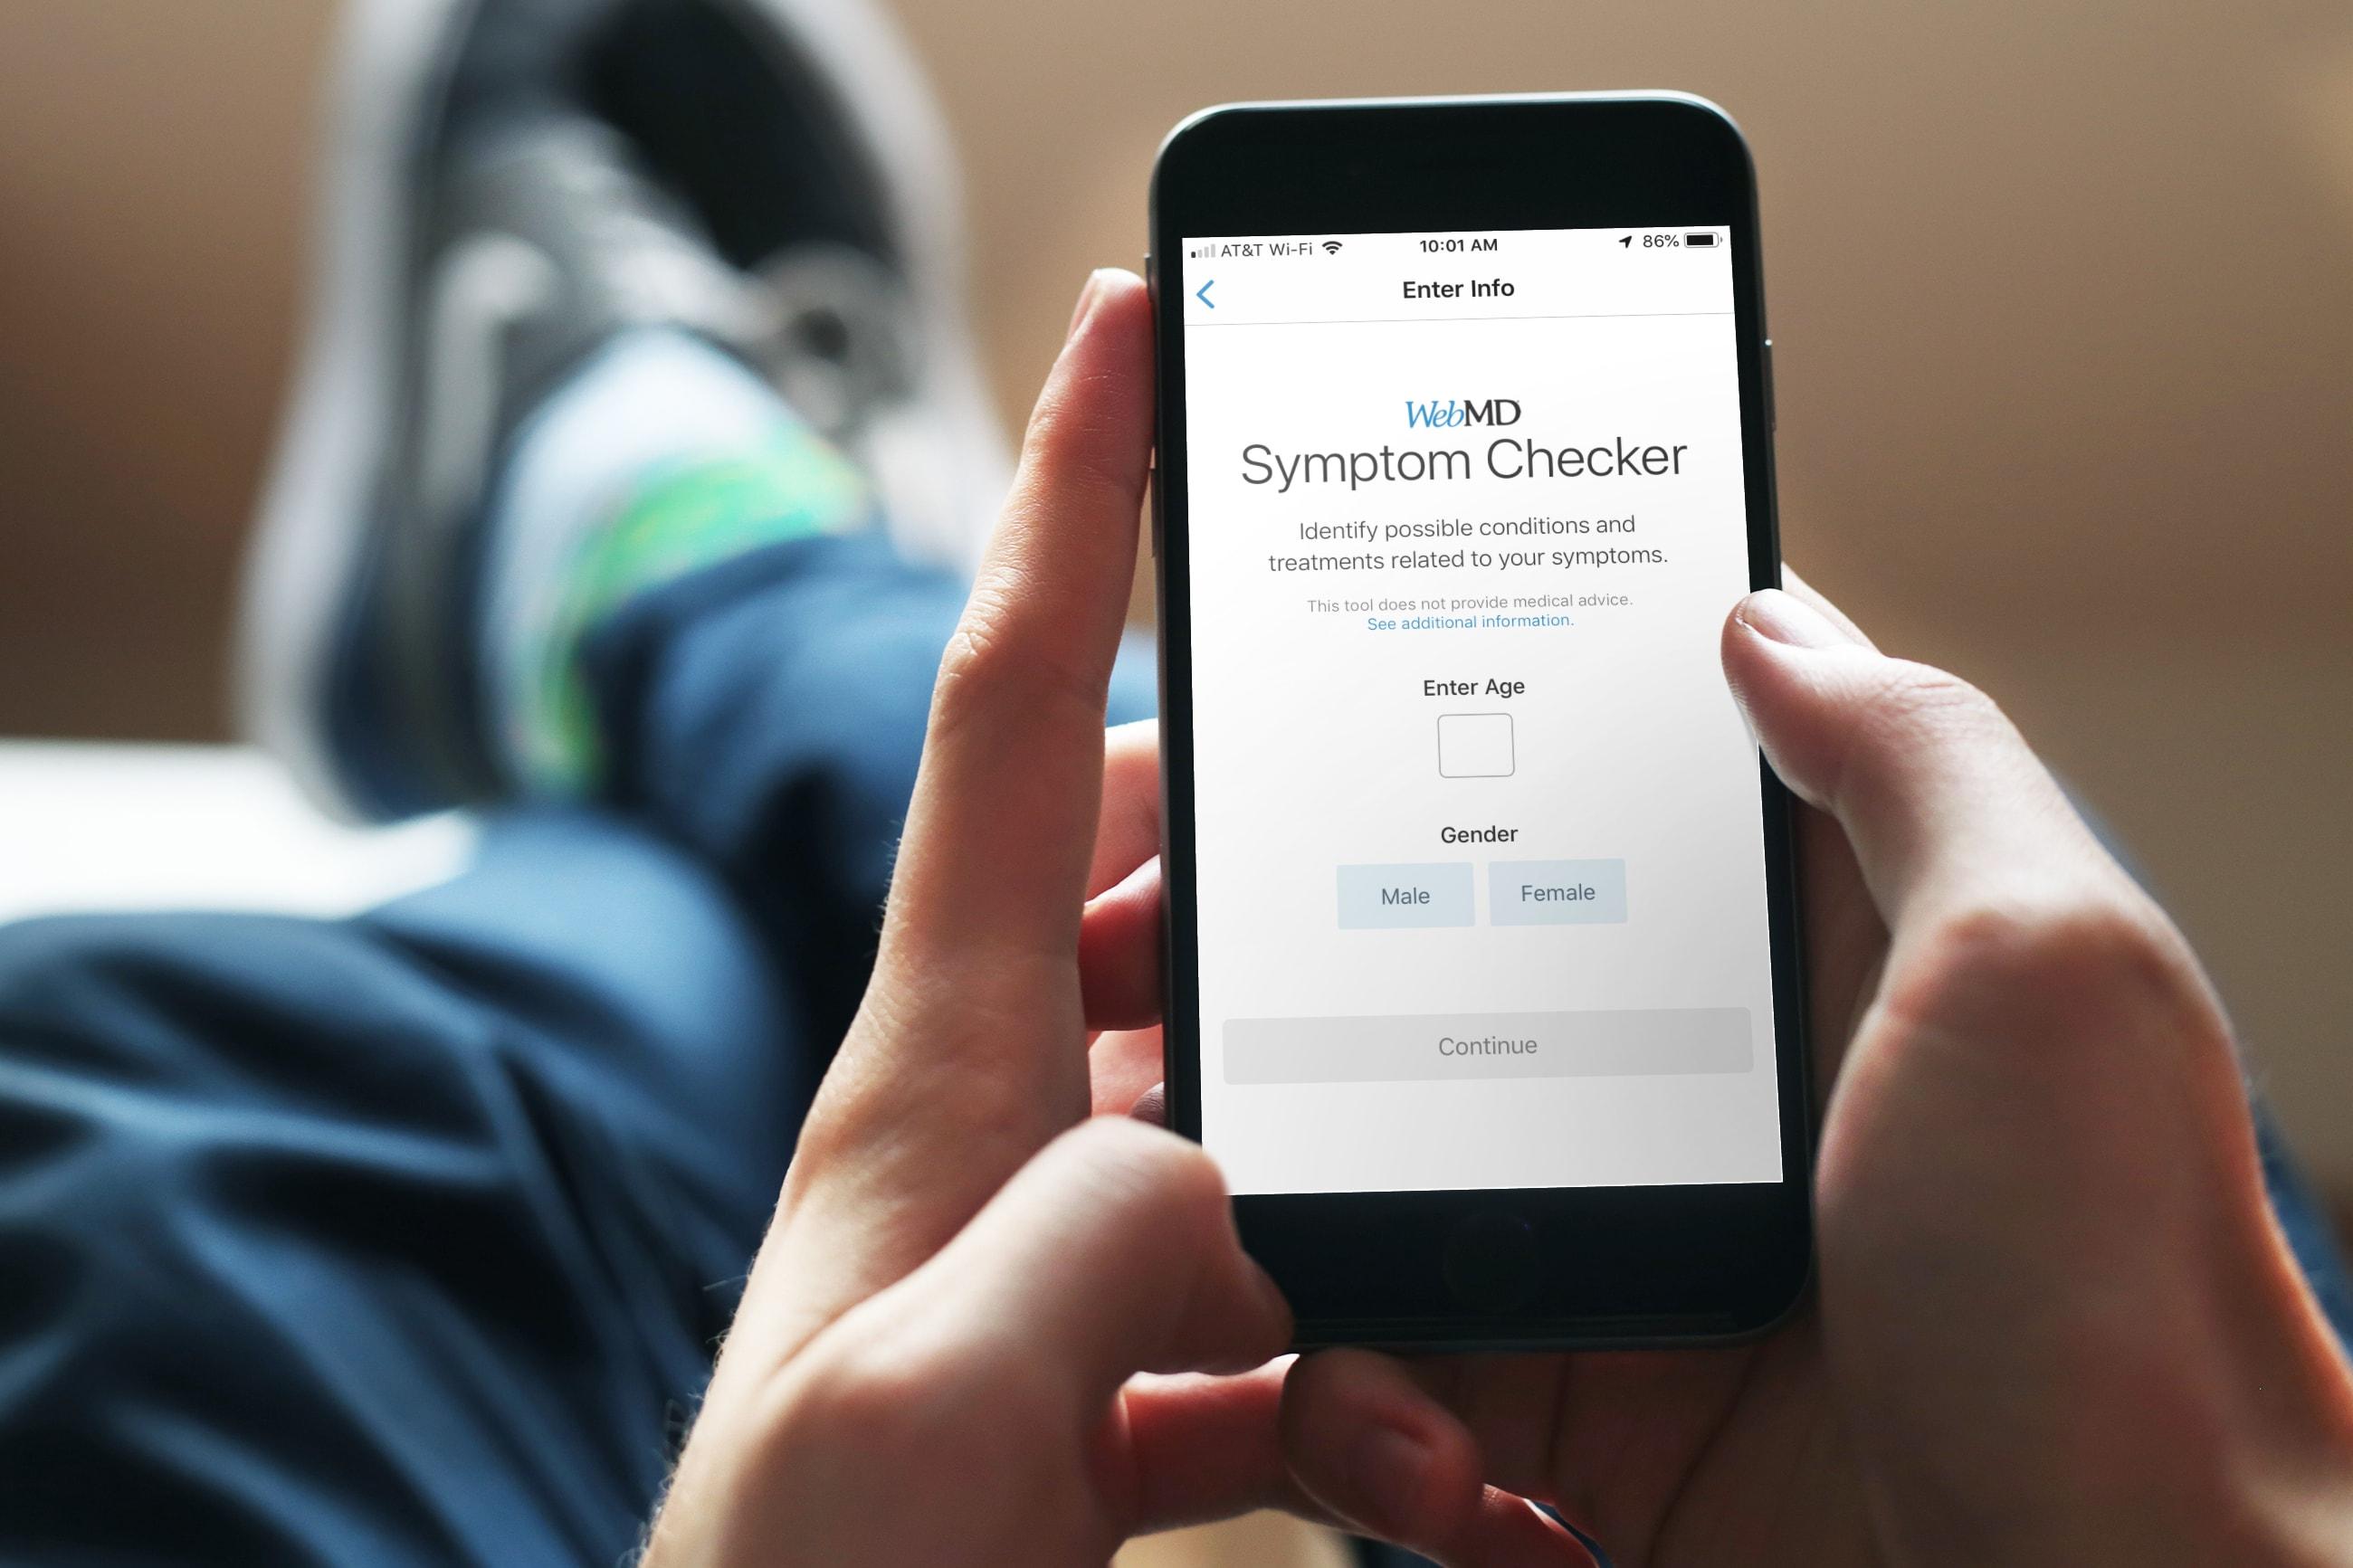 Medical Information Apps iPhone - WebMD